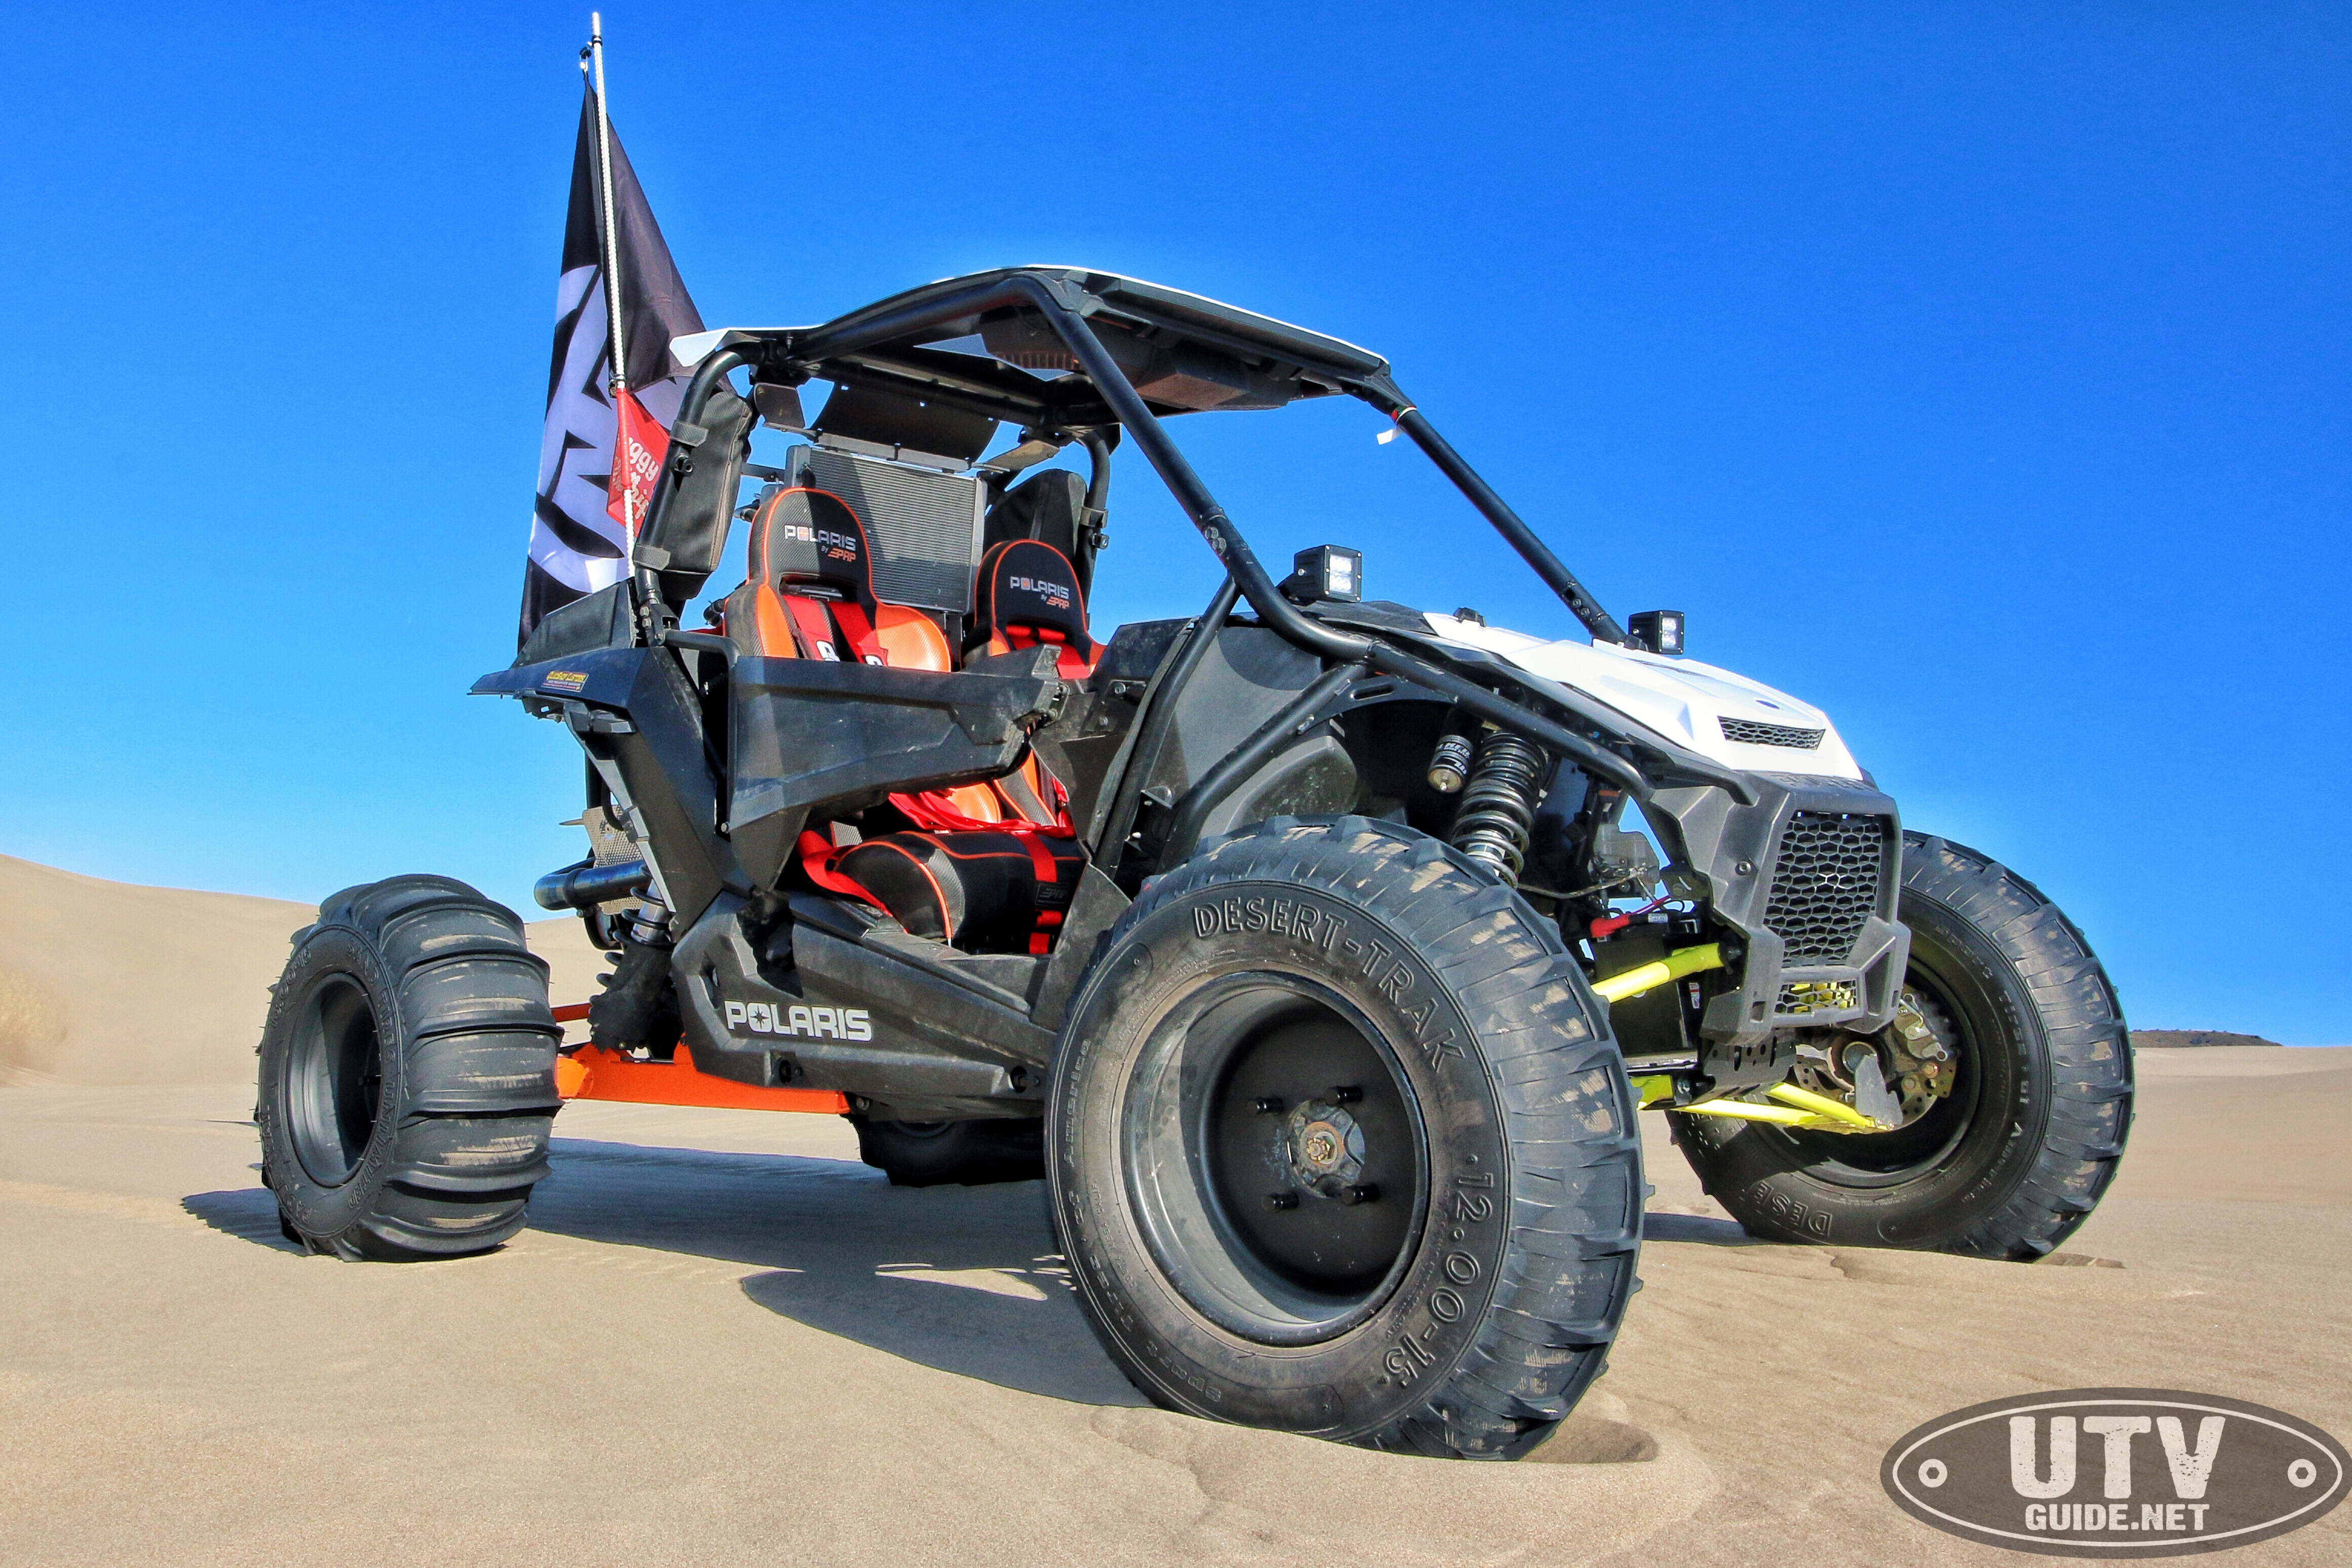 A Polaris Employee Build's His Own Two Wheel Drive